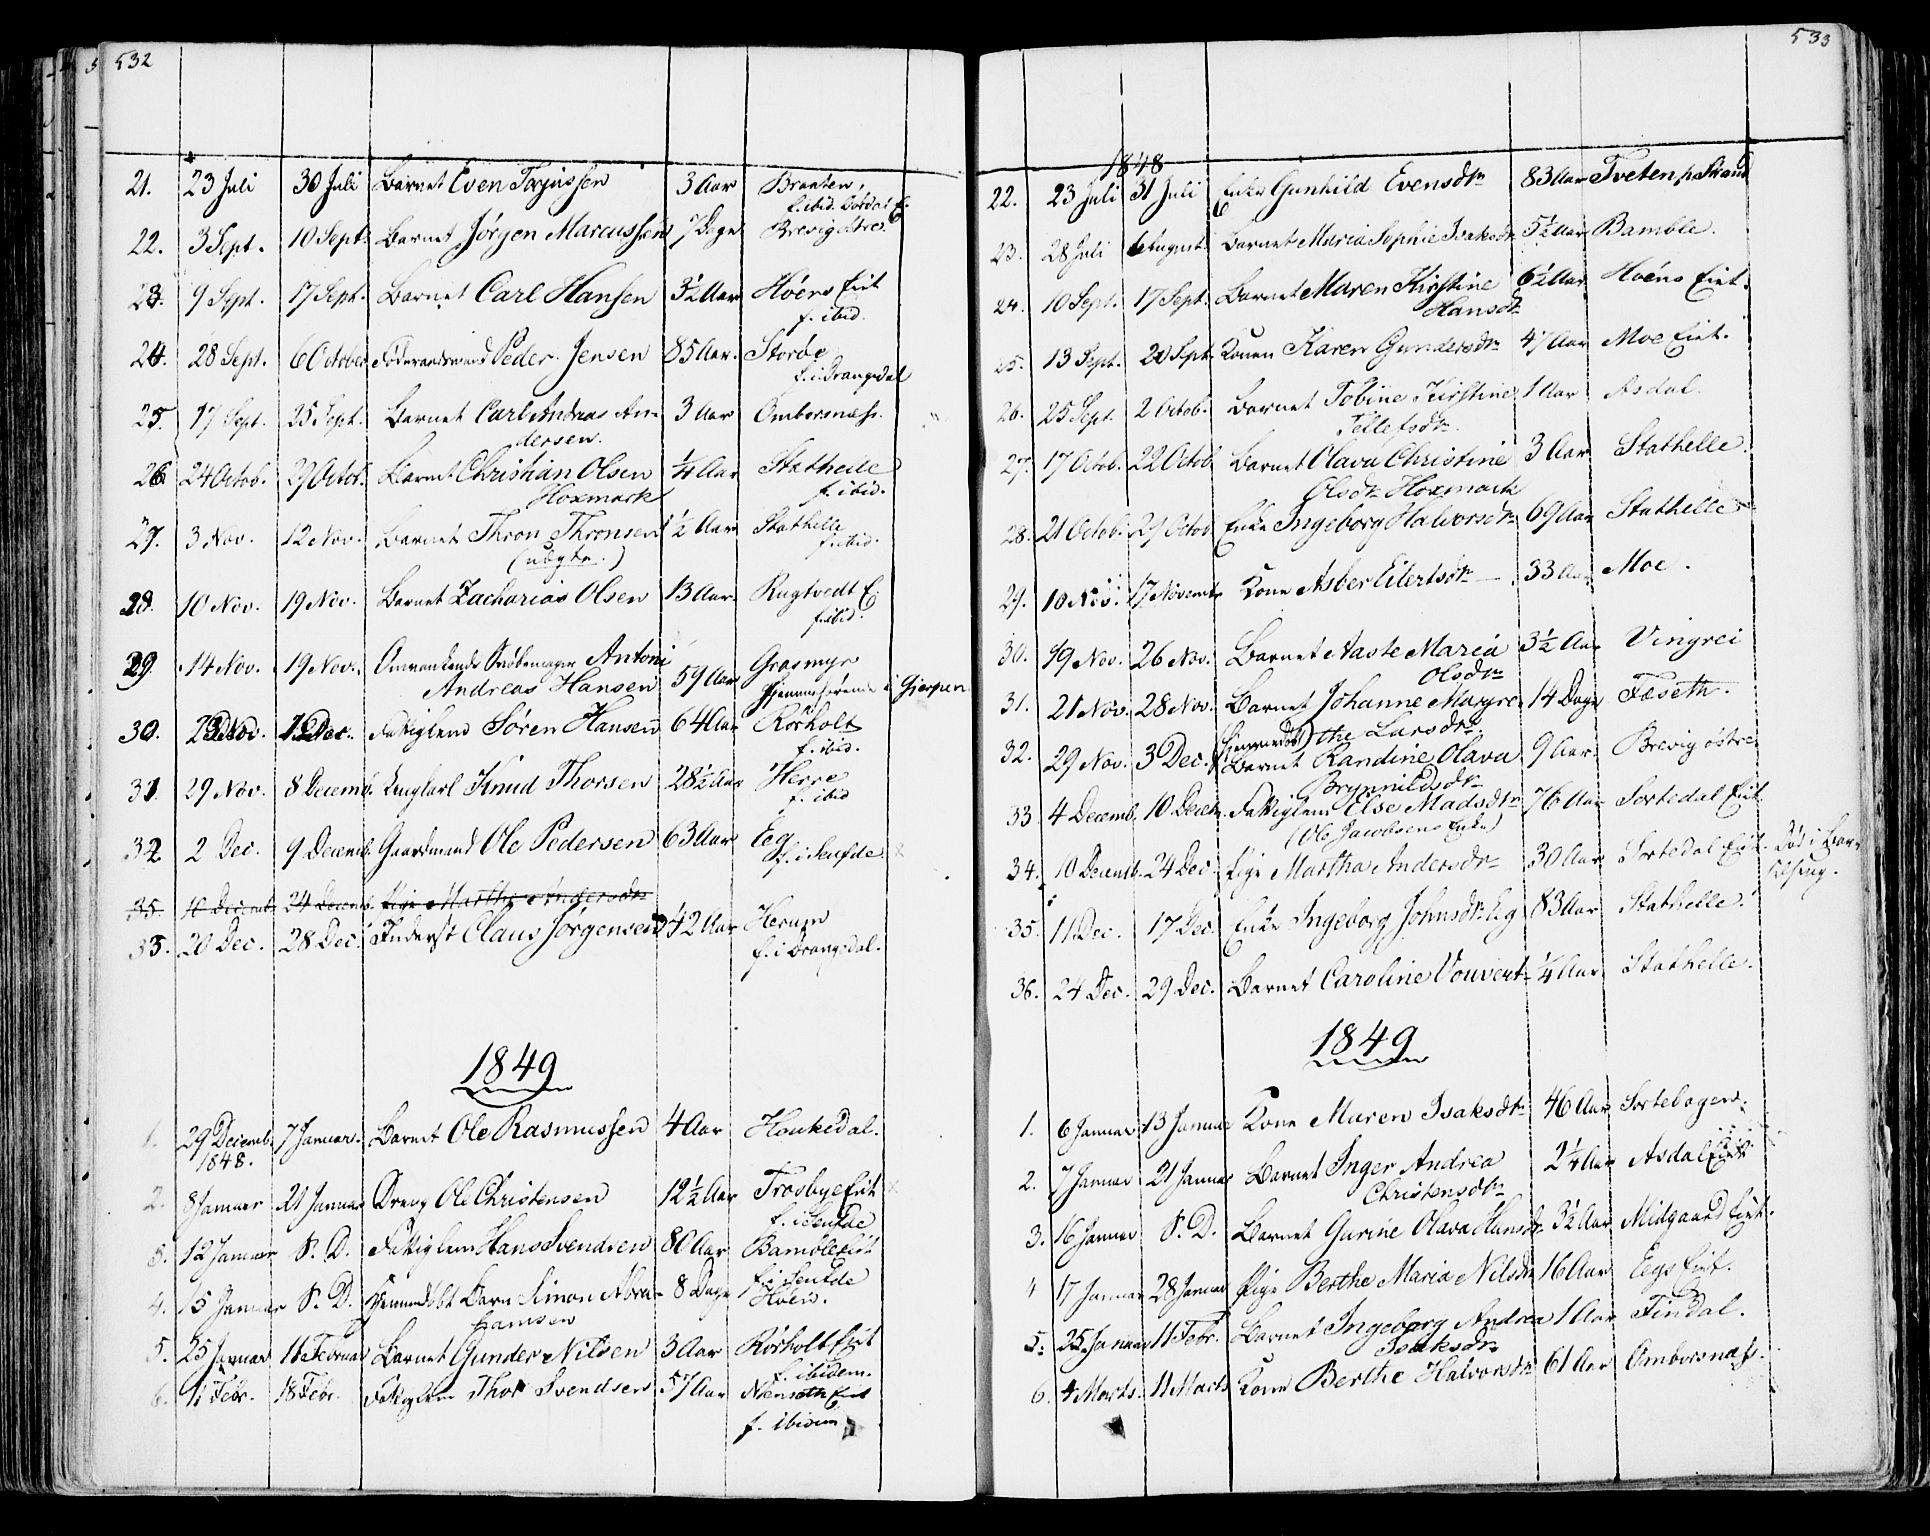 SAKO, Bamble kirkebøker, F/Fa/L0004: Ministerialbok nr. I 4, 1834-1853, s. 532-533